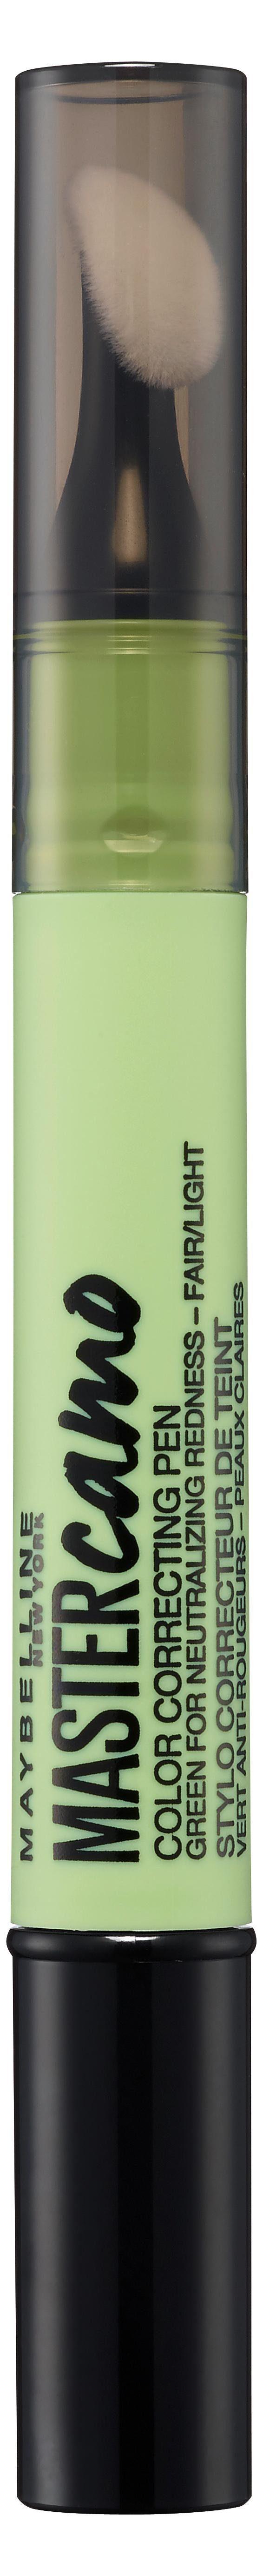 Maybelline New York, »Master Camouflage Corrector Pen«, Concealer